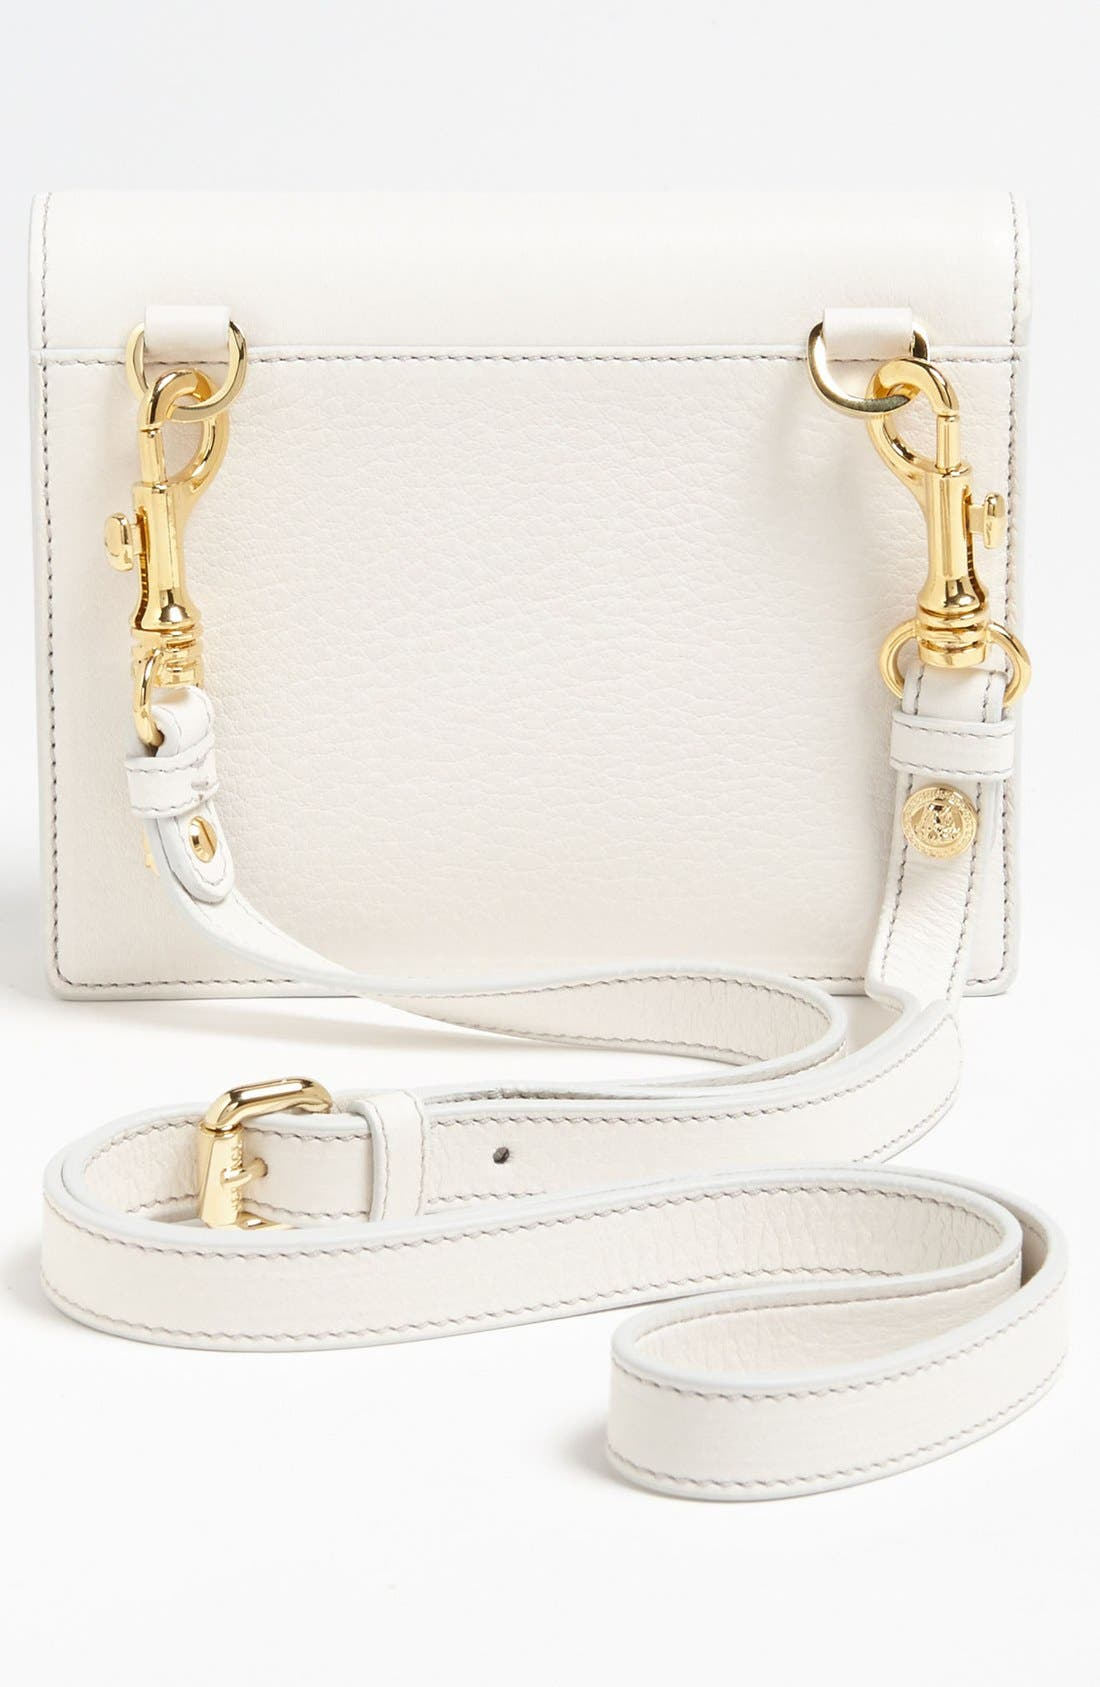 VERSACE,                             'Mini - Medusa' Leather Crossbody Bag,                             Alternate thumbnail 2, color,                             100